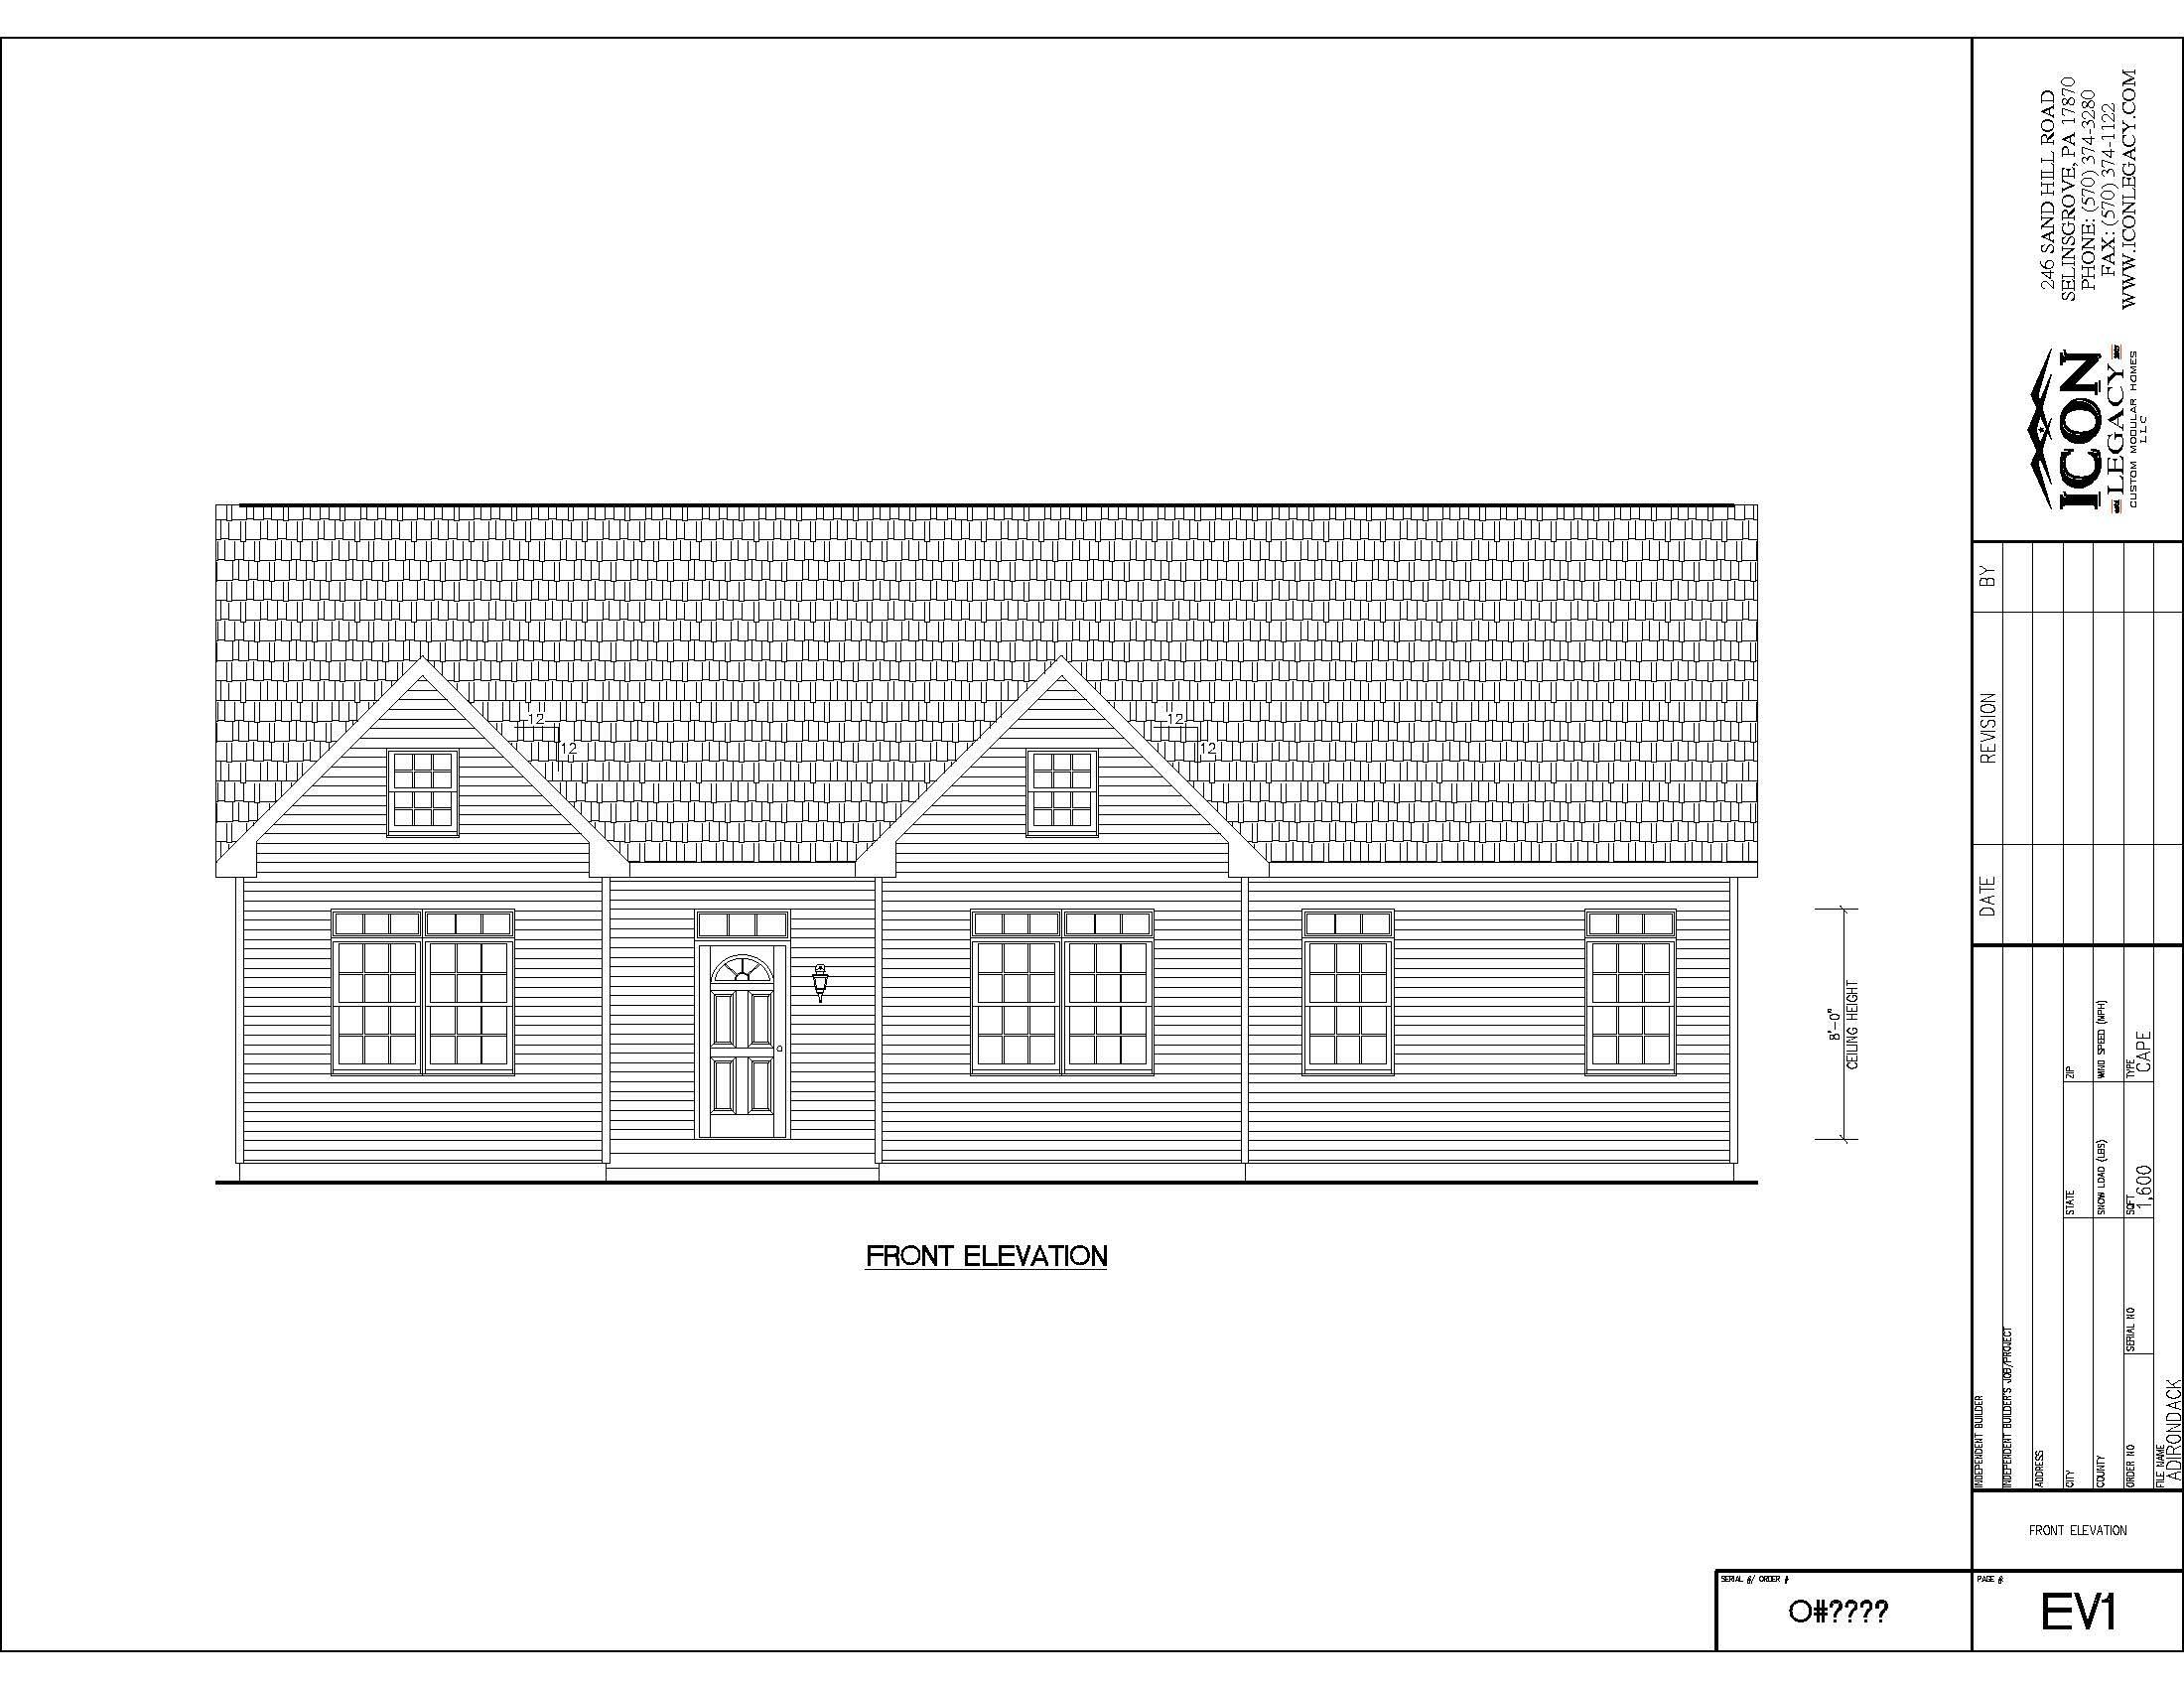 Adirondack modular home drawing